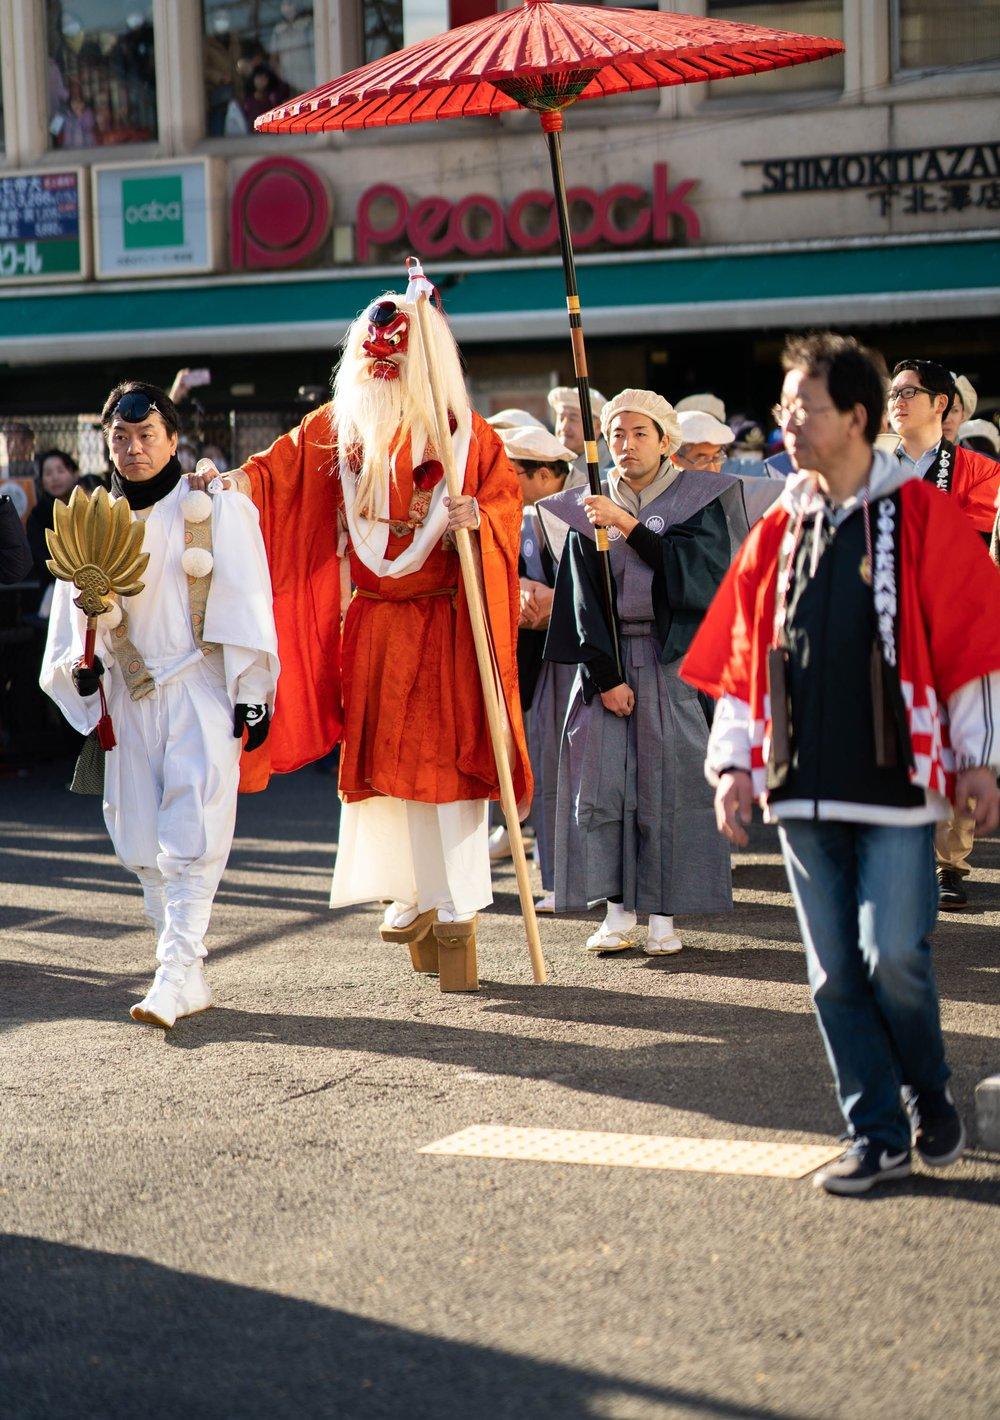 Tengu festival, Shimo Kitazawa -